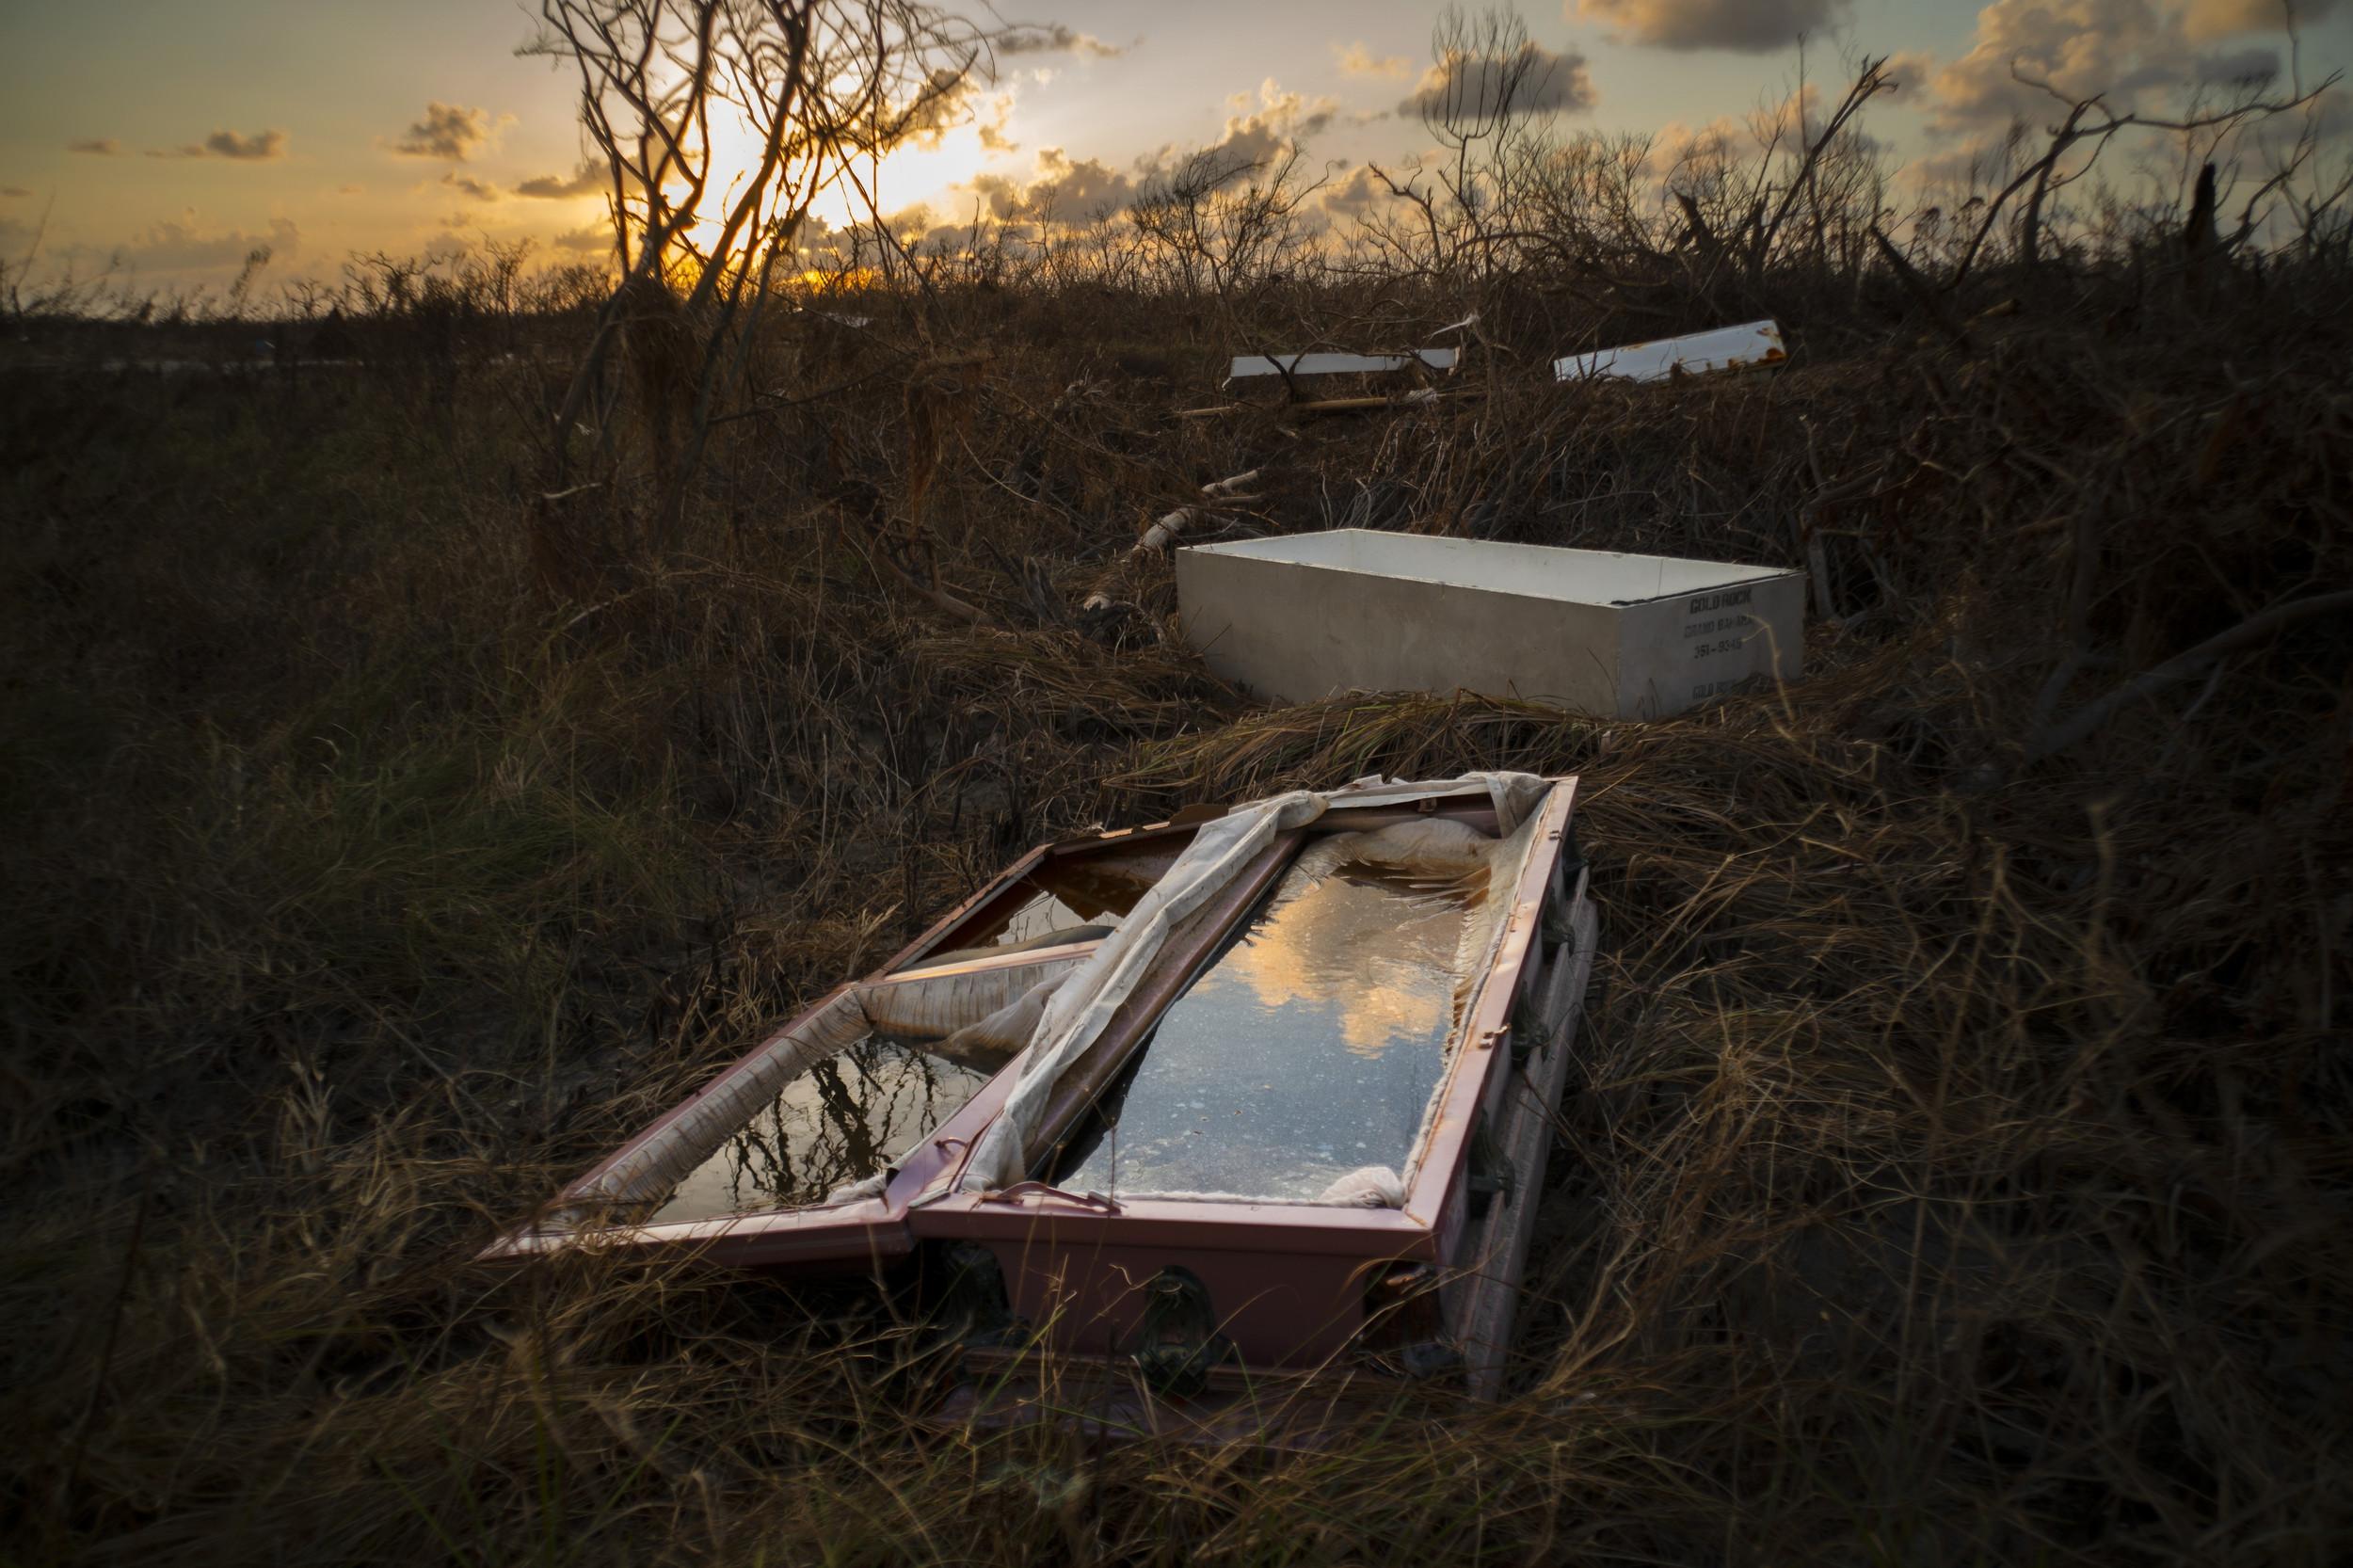 After Dorian, Bahamas Tackles Massive Cleanup